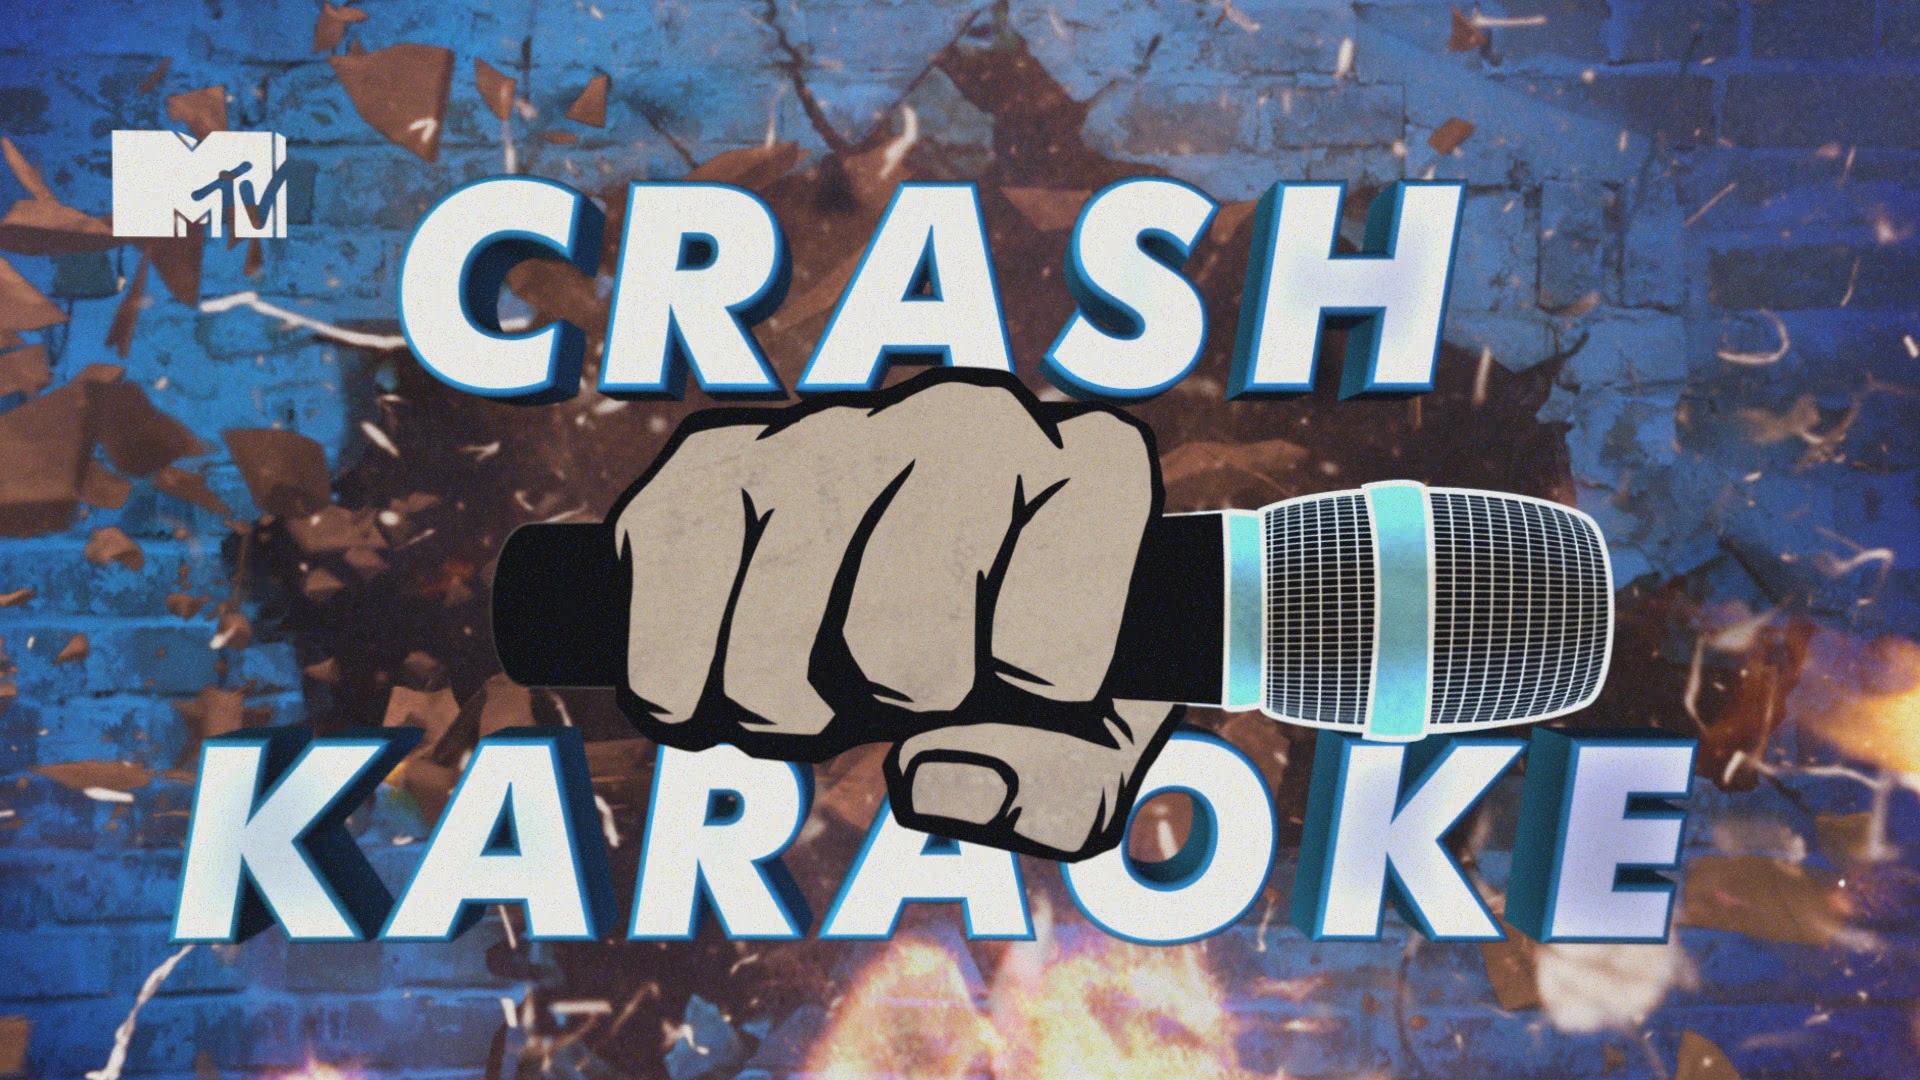 MTV   Crash Karaoke is a pop-up karaoke game show that bursts in on unassuming locations.